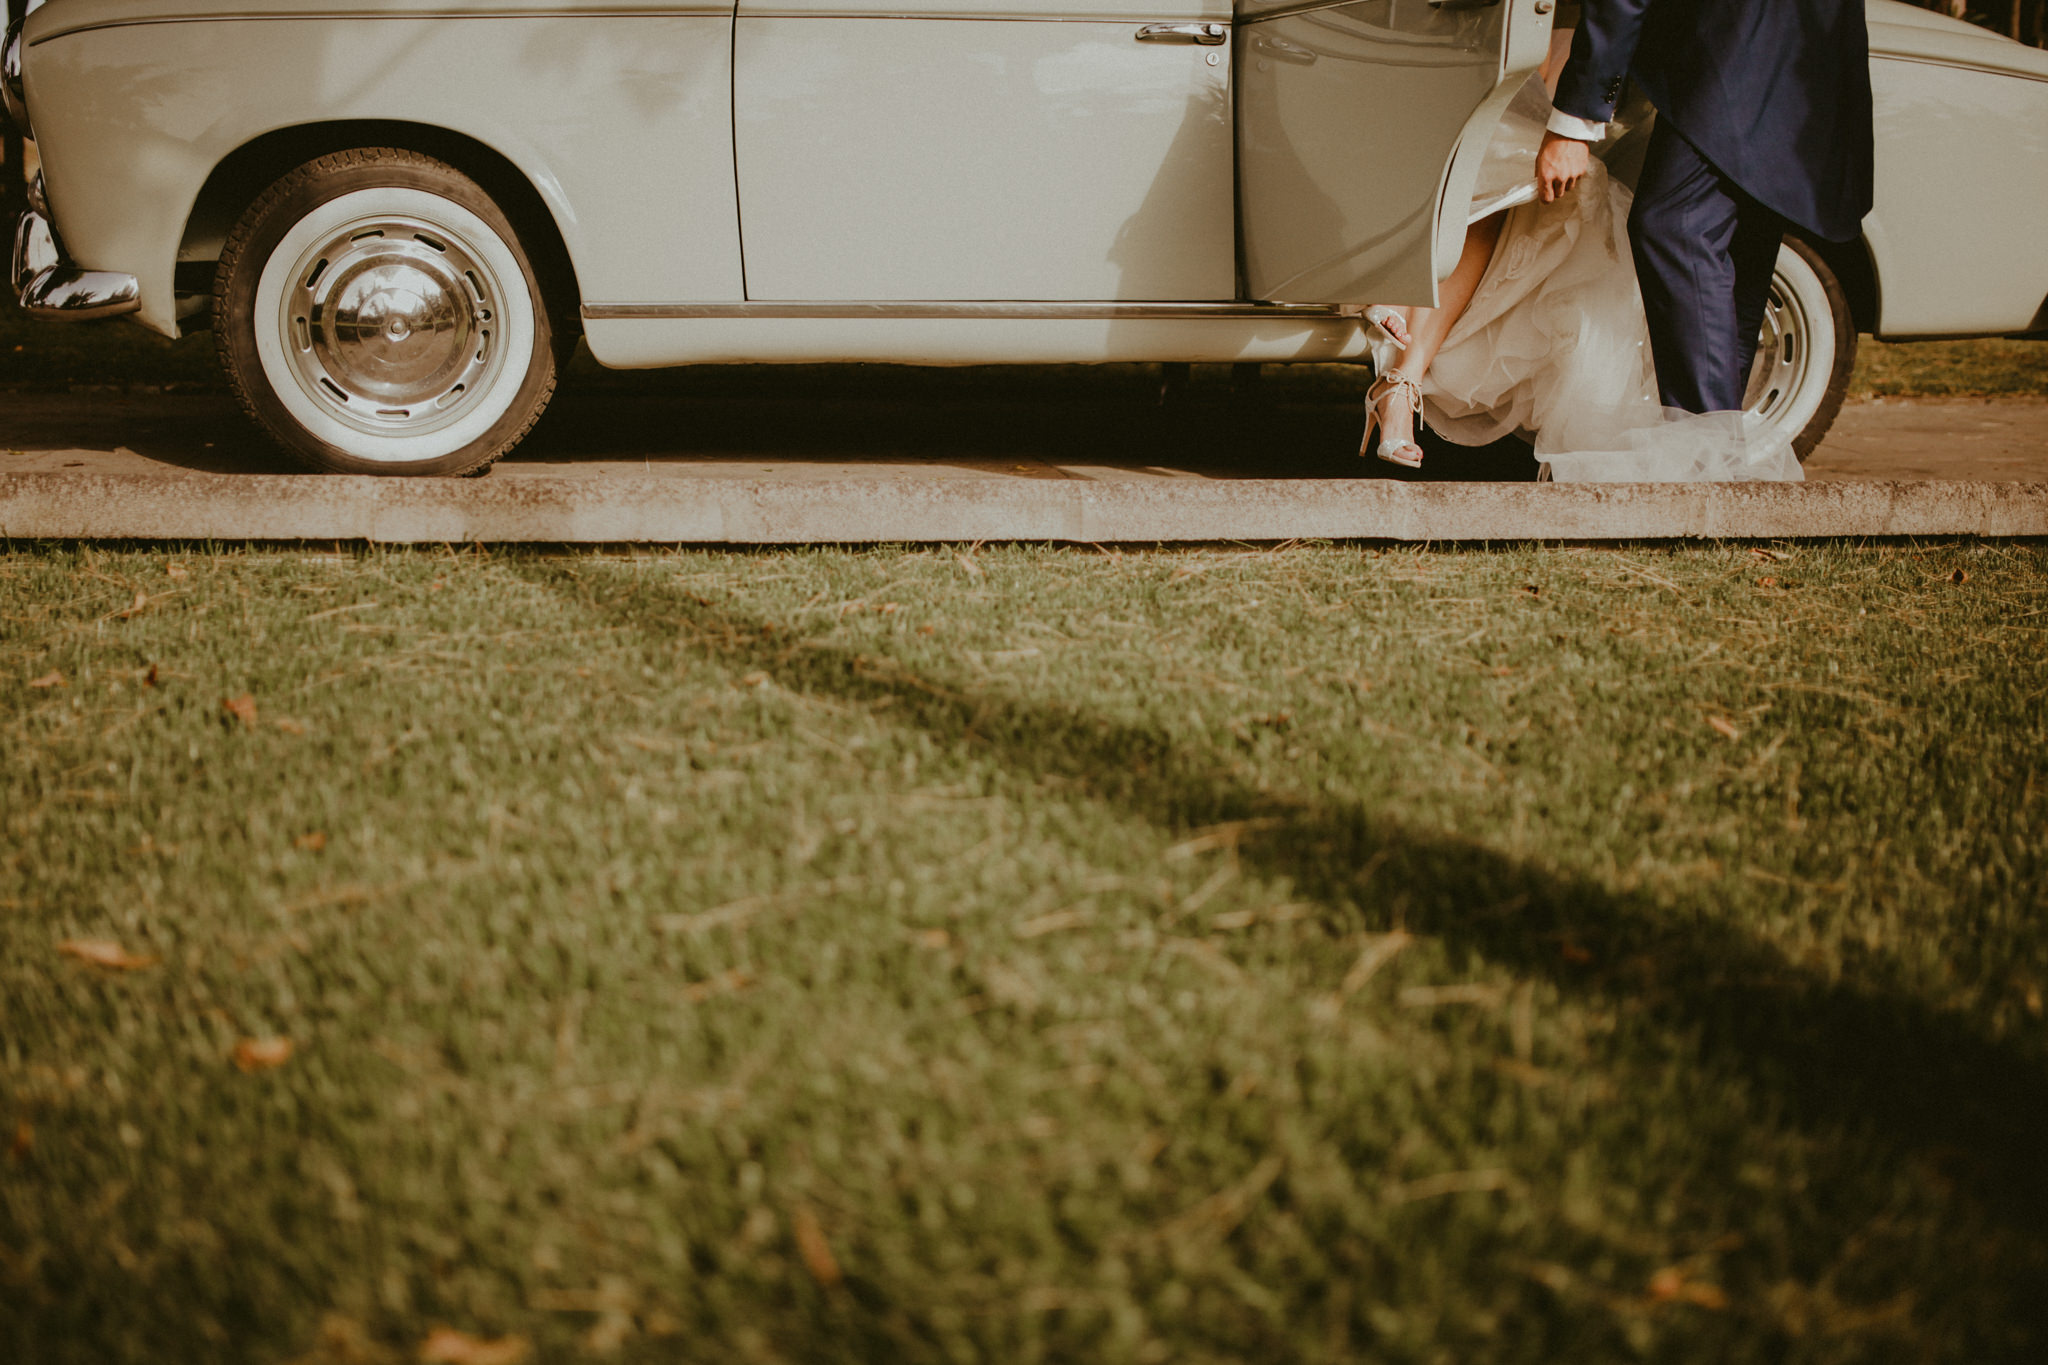 boda-diferente-fotografo-boda-laspalmas-grancanaria-60